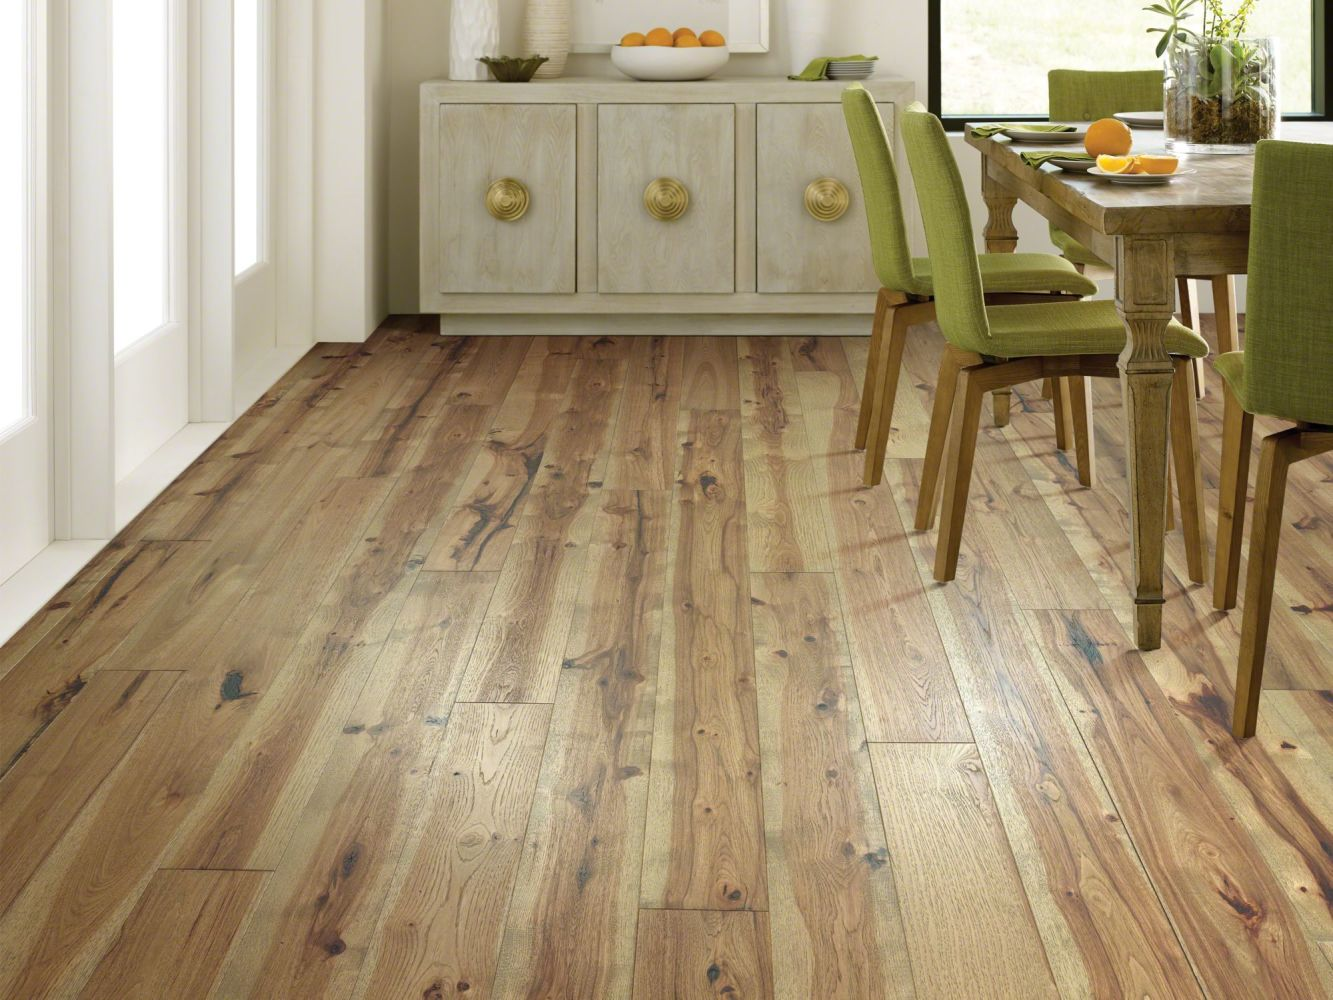 Shaw Floors Duras Hardwood Impressions Hickory Radiance 07036_HW673